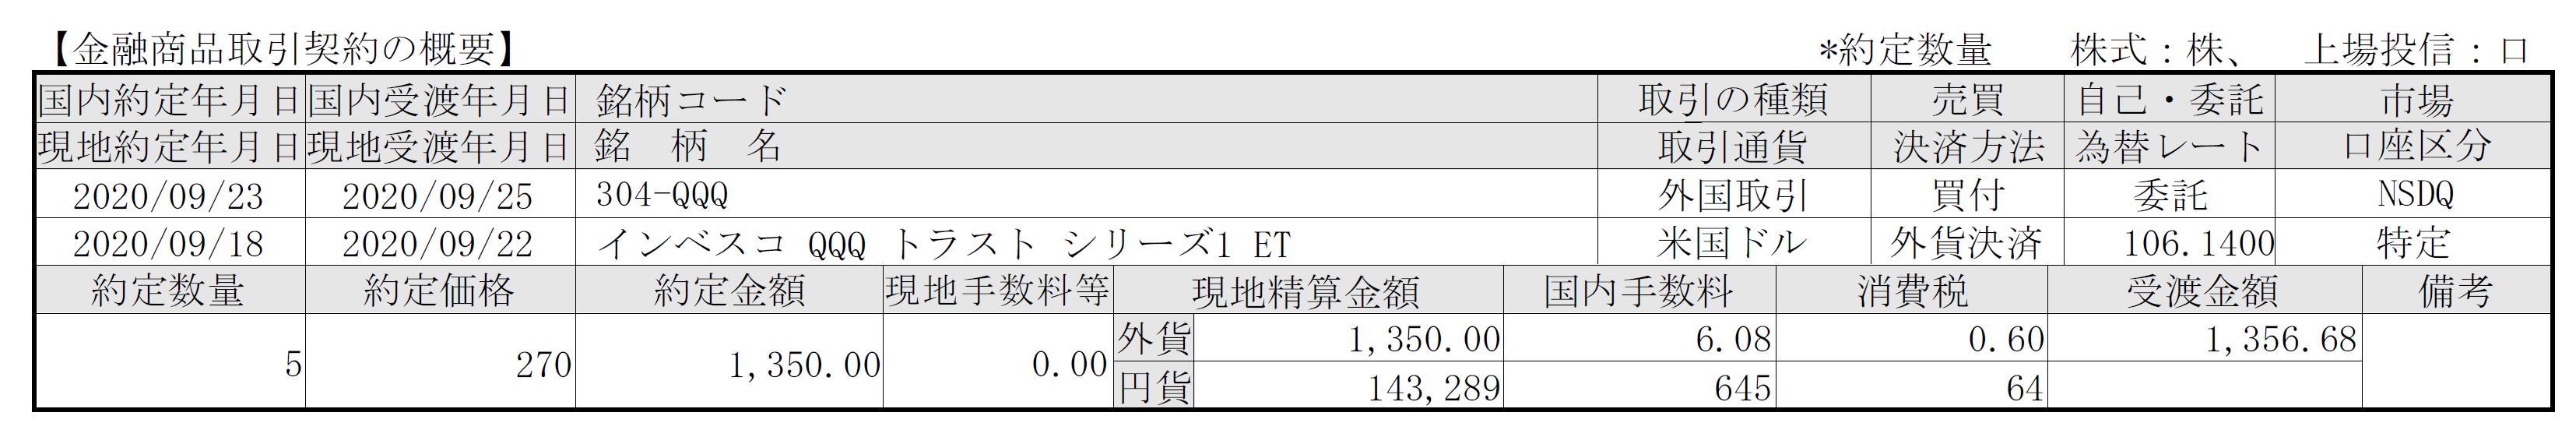 f:id:hodo-work:20200924191542p:plain